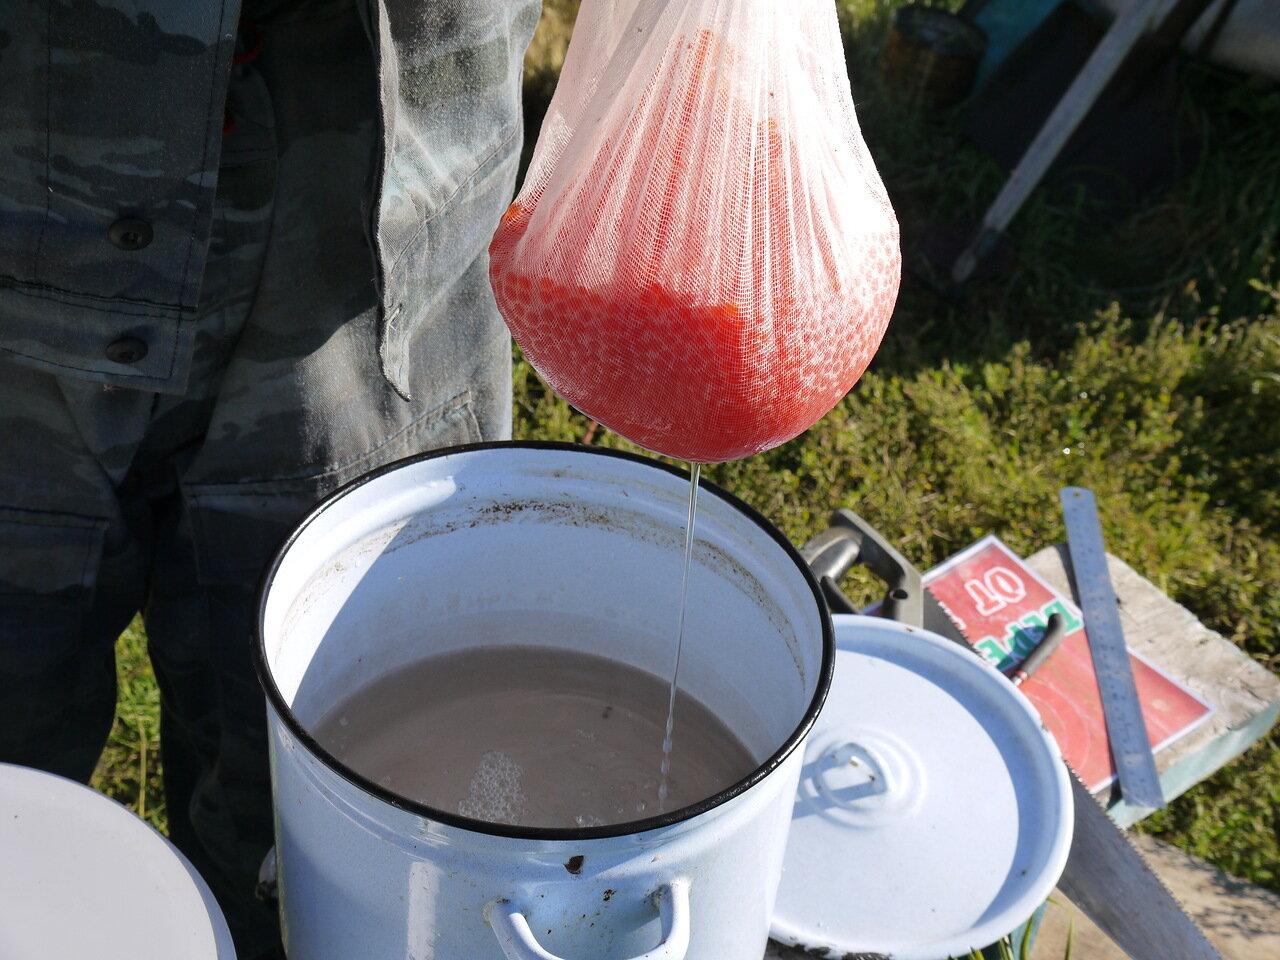 Как готовят красную икру в домашних условиях по-камчатски